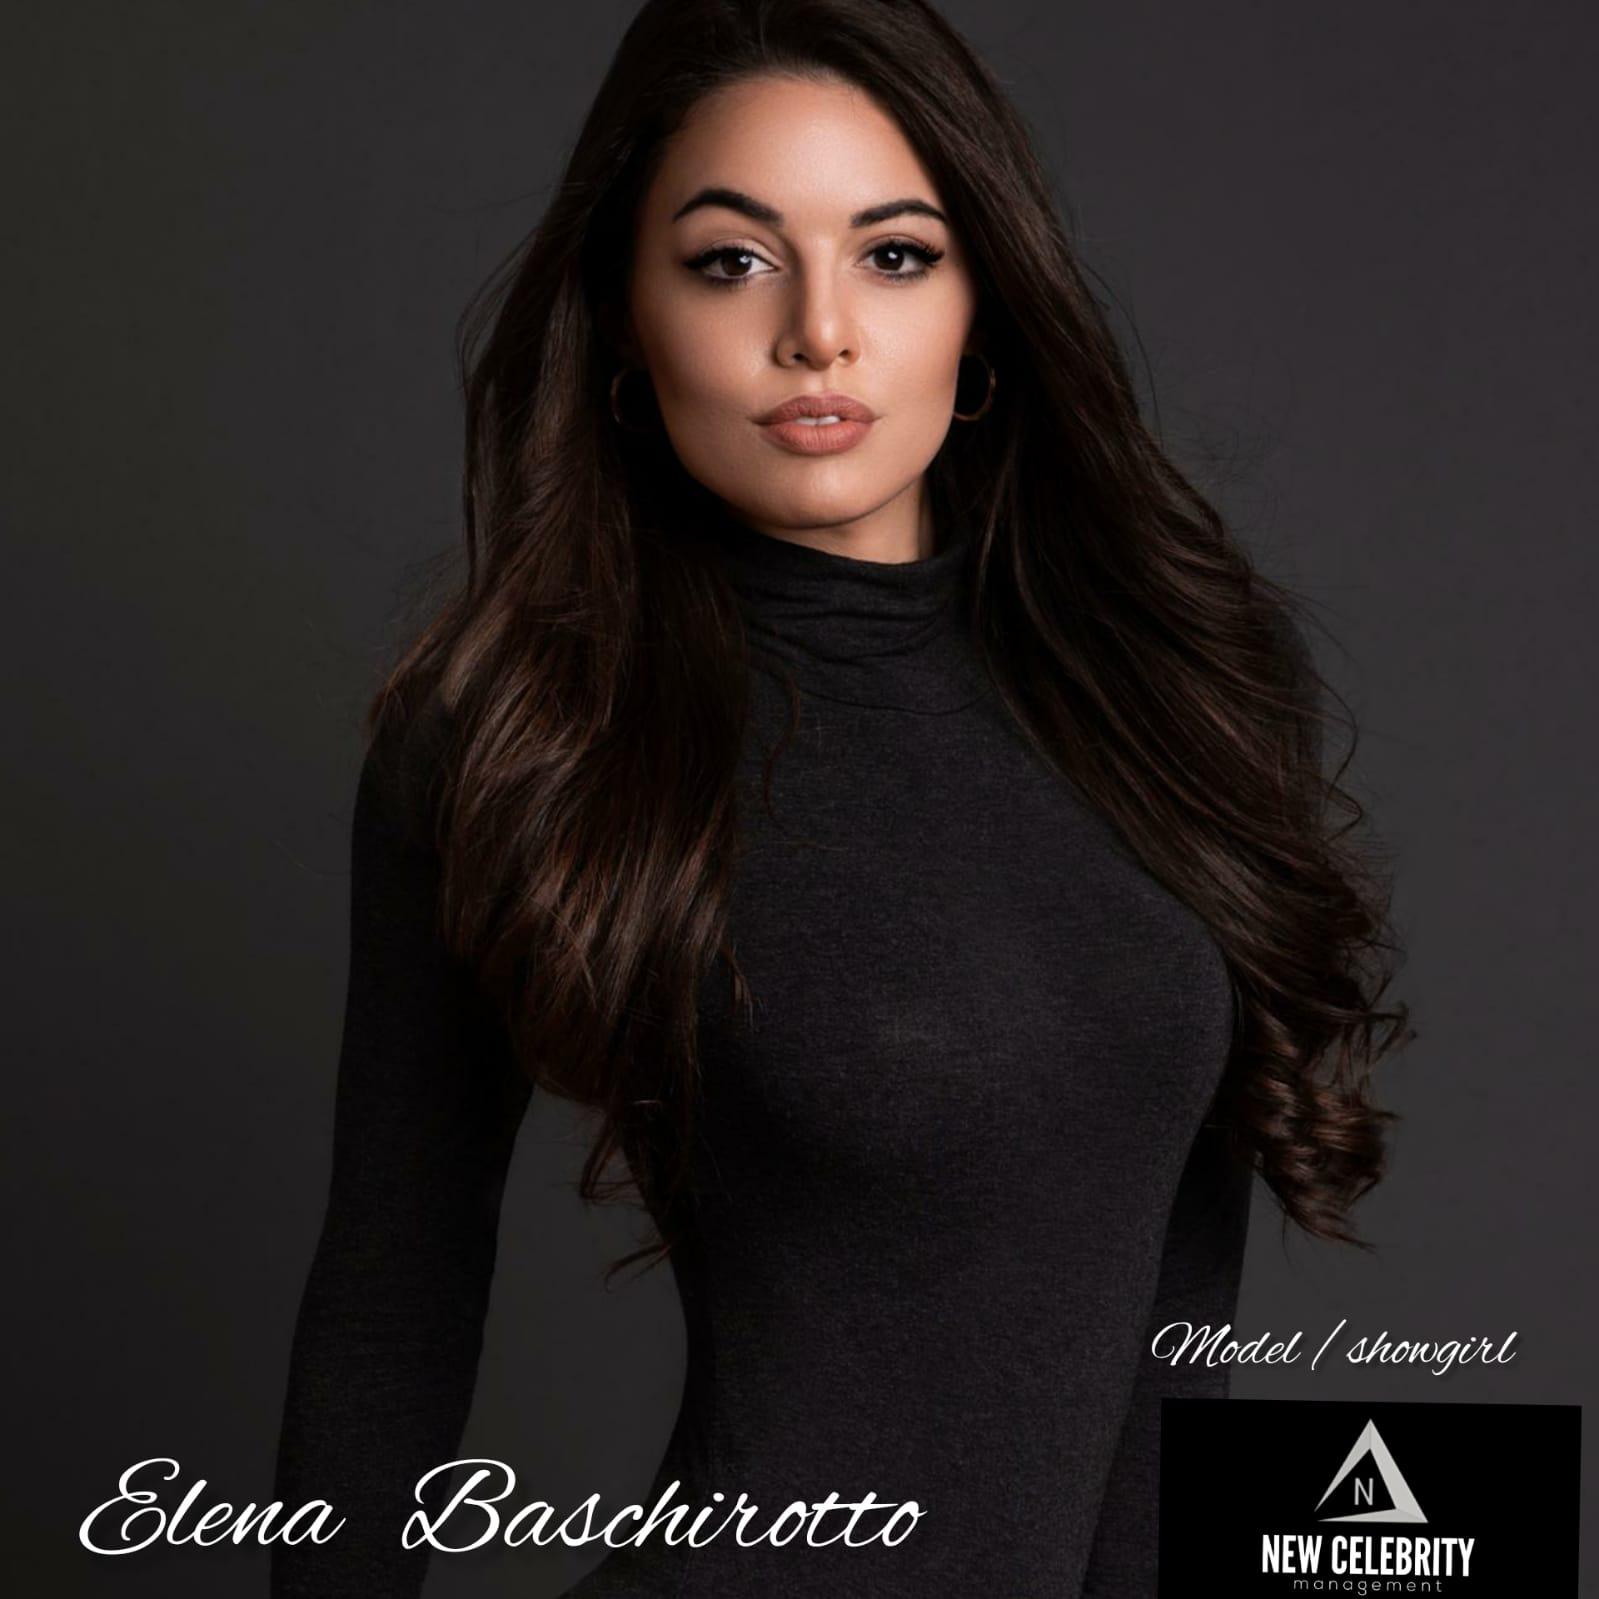 Elena Baschirotto